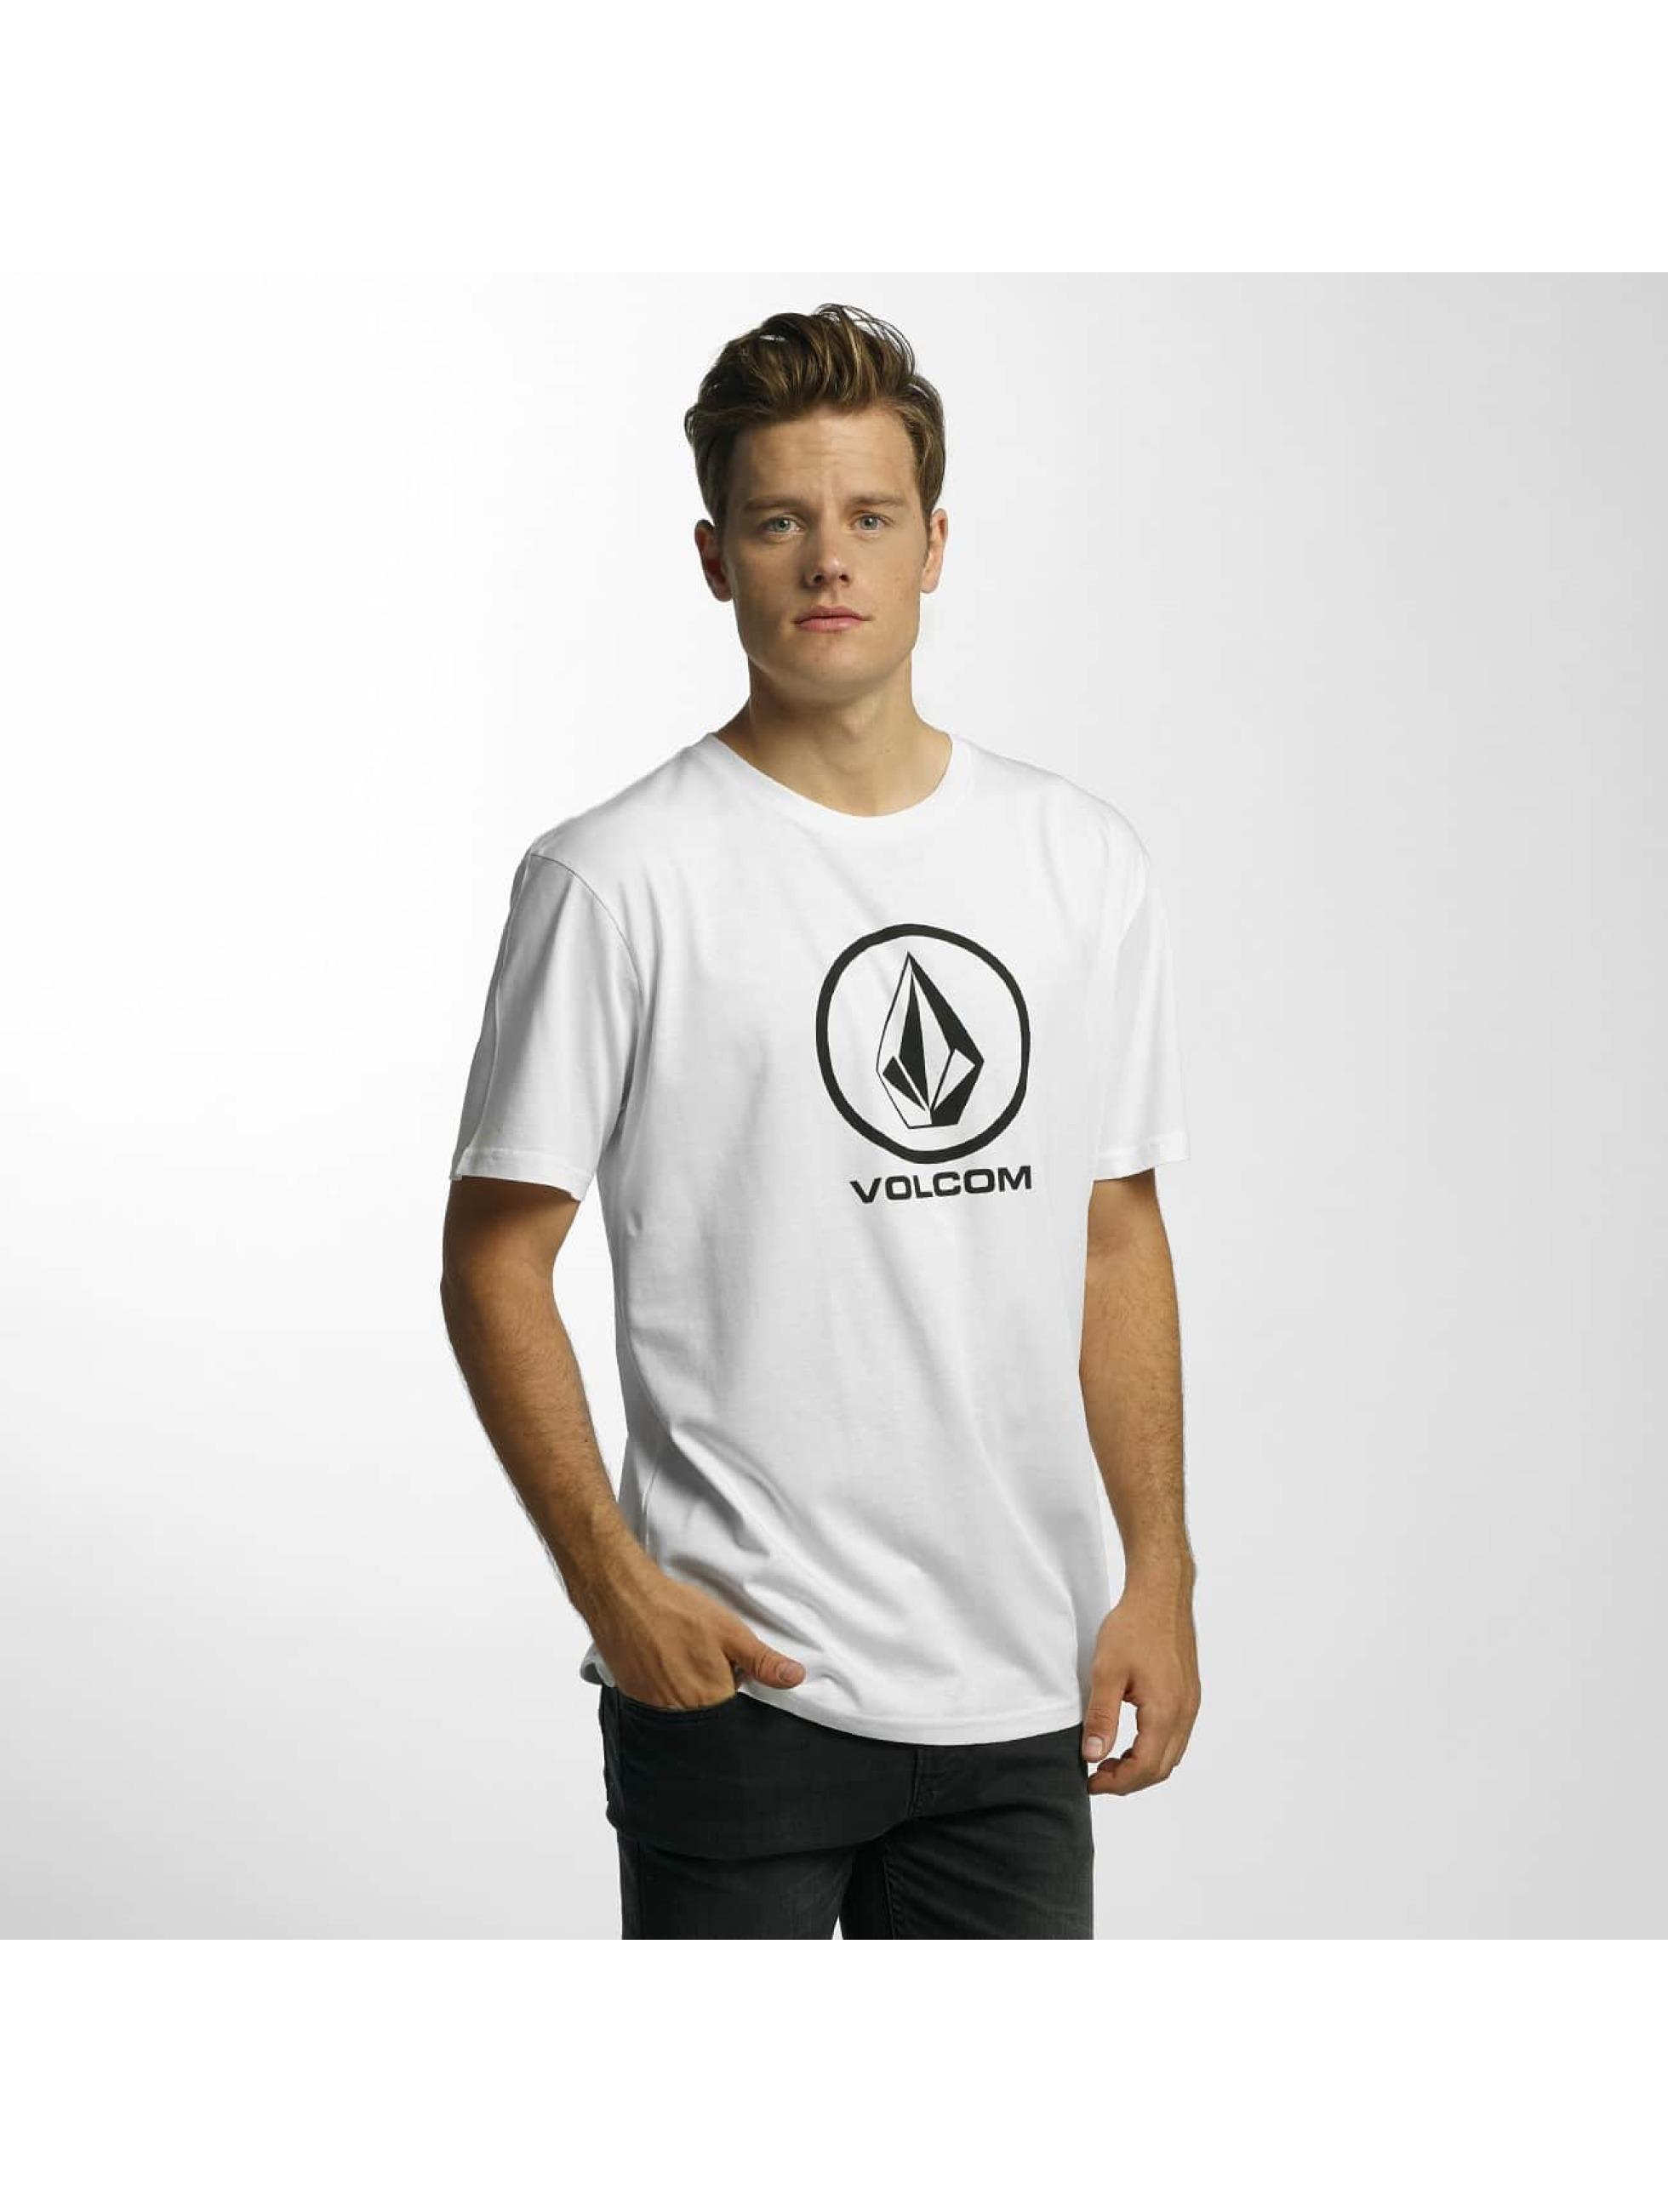 Volcom-Homme-Hauts-T-Shirt-Circle-Stone-Basic